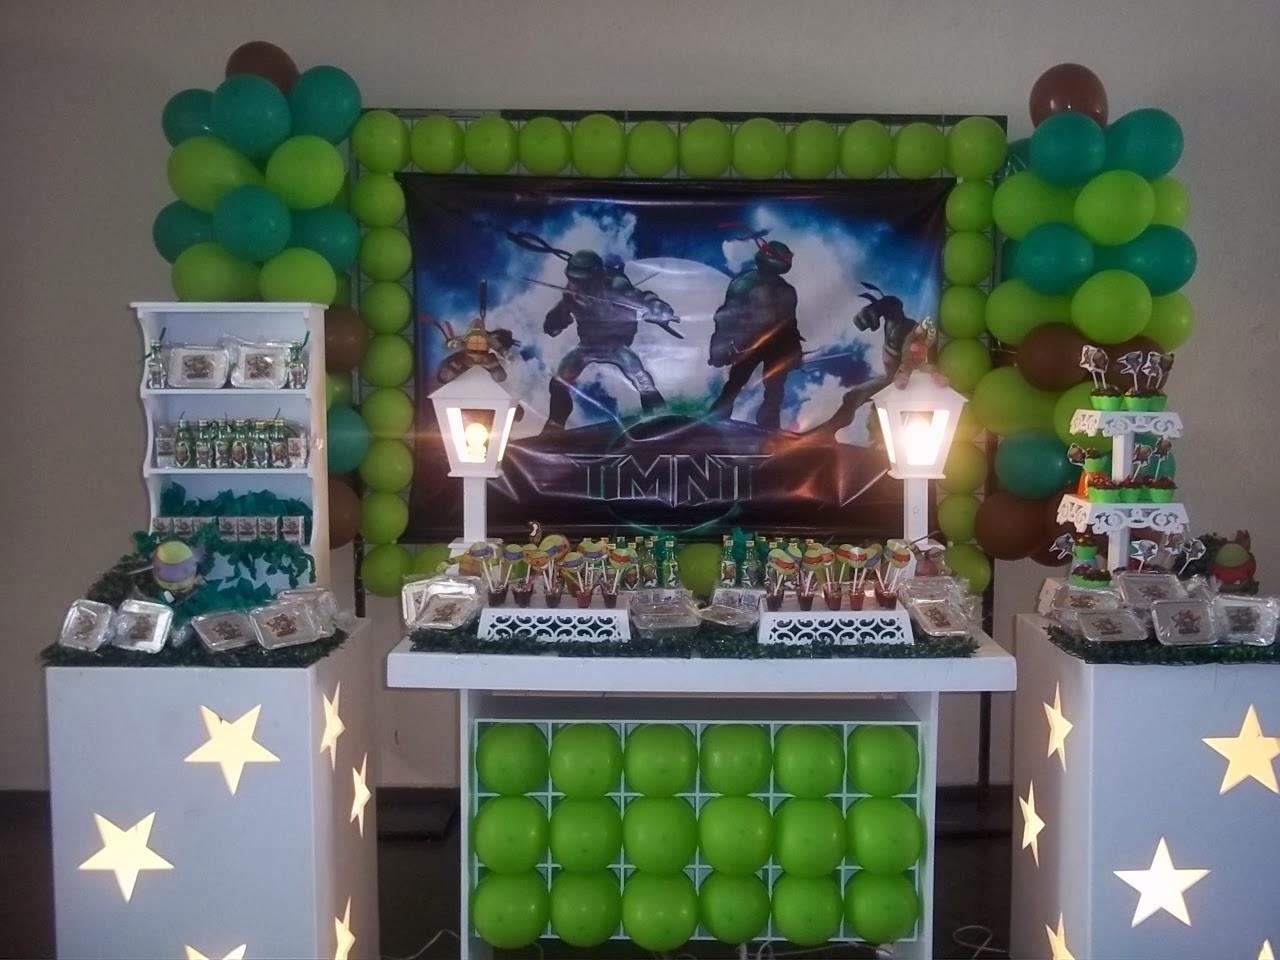 festa jardim da clarilu:abá Festas: Decoração Tartarugas Ninja